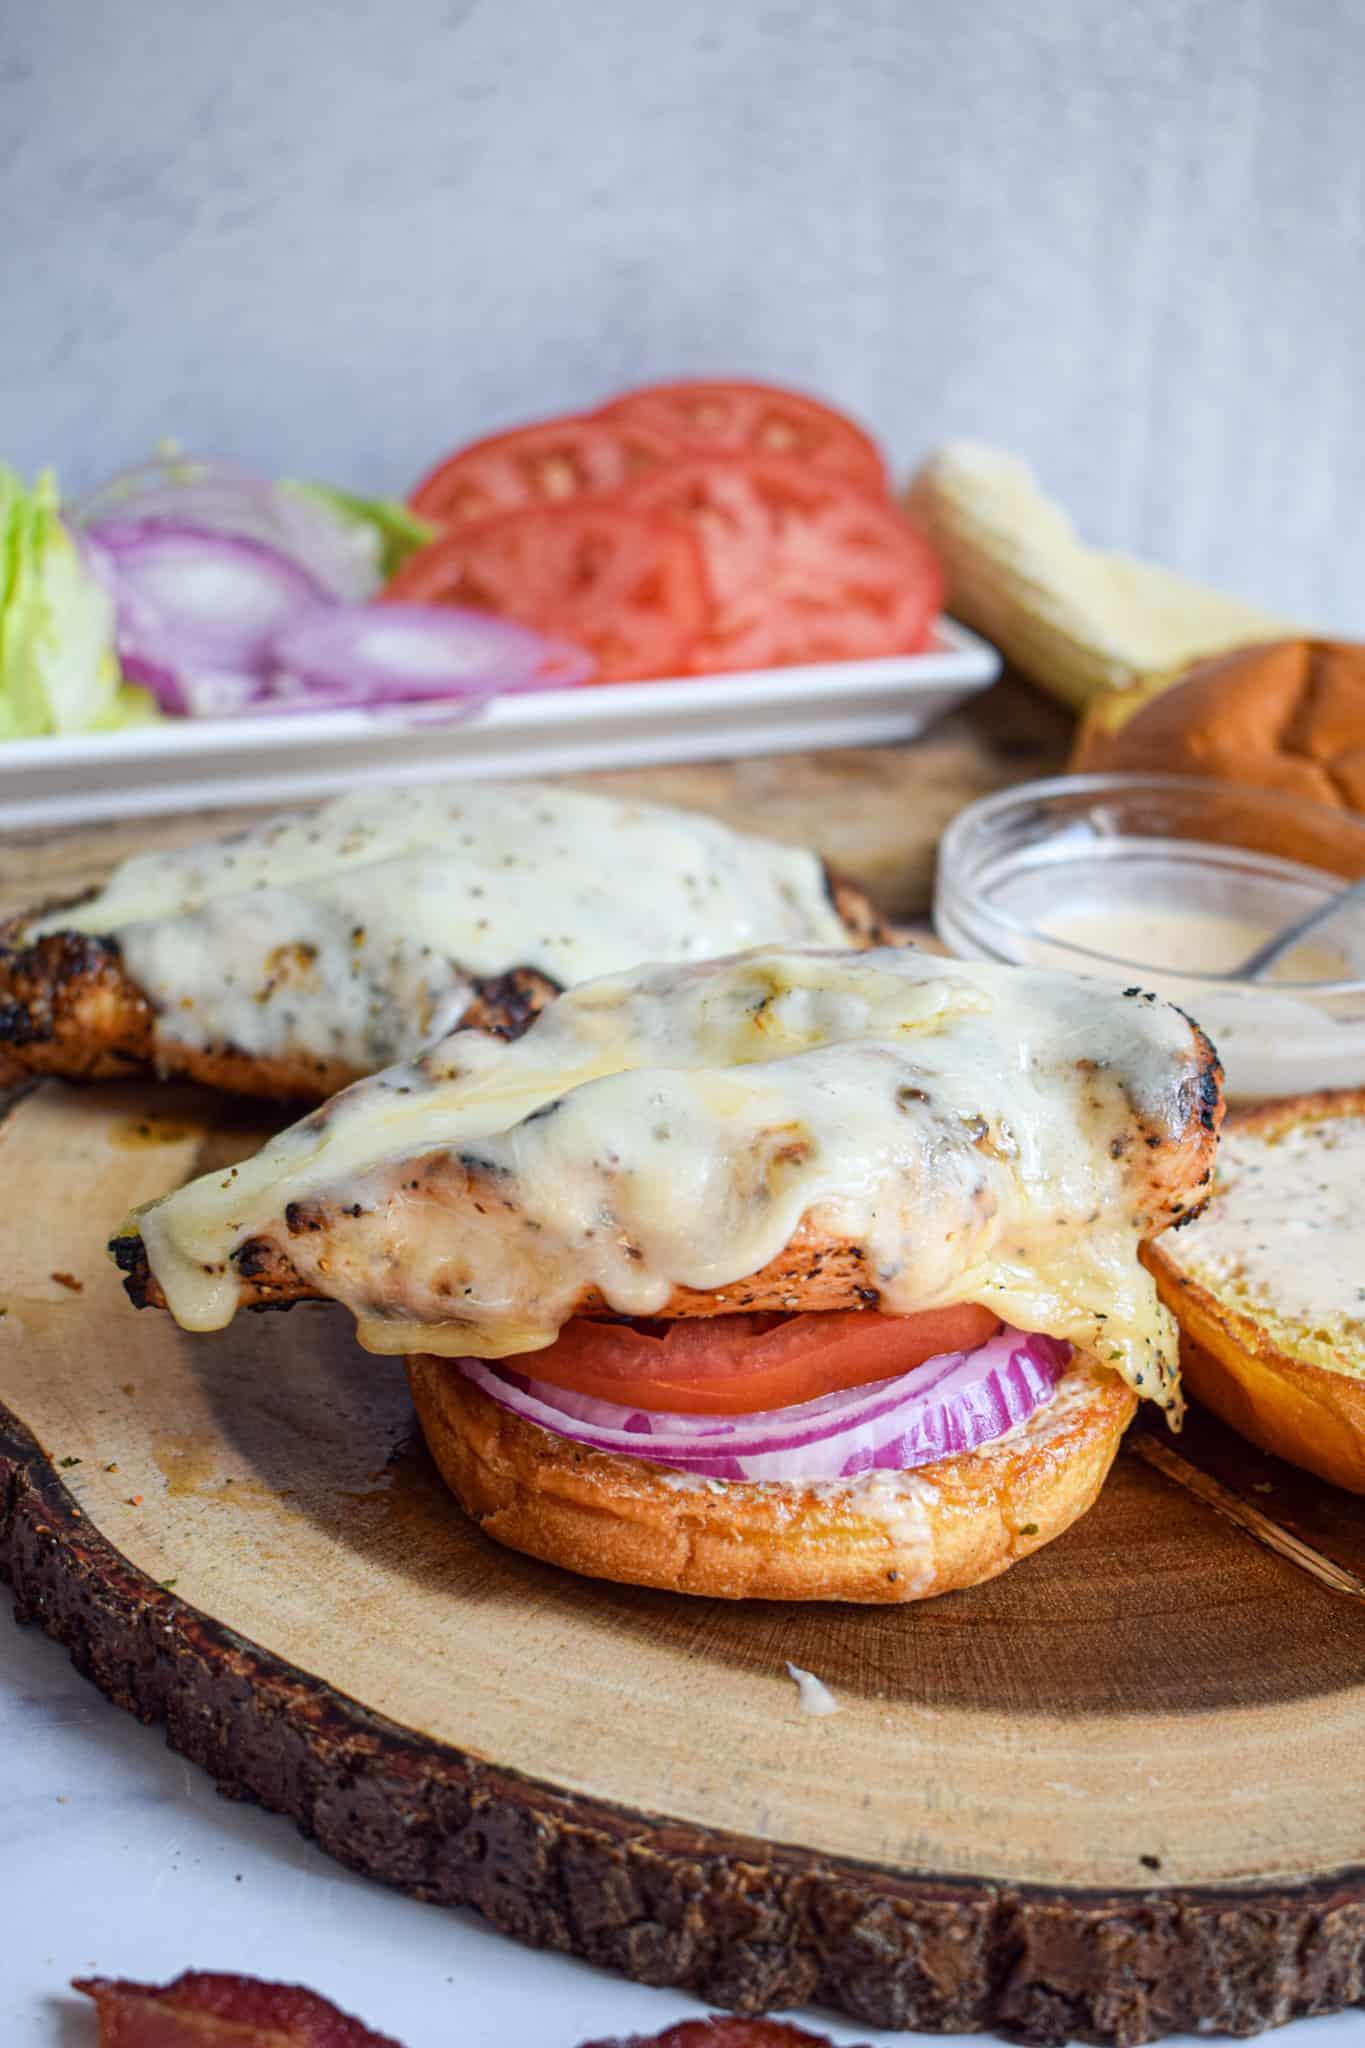 assemble grilled chicken sandwiches